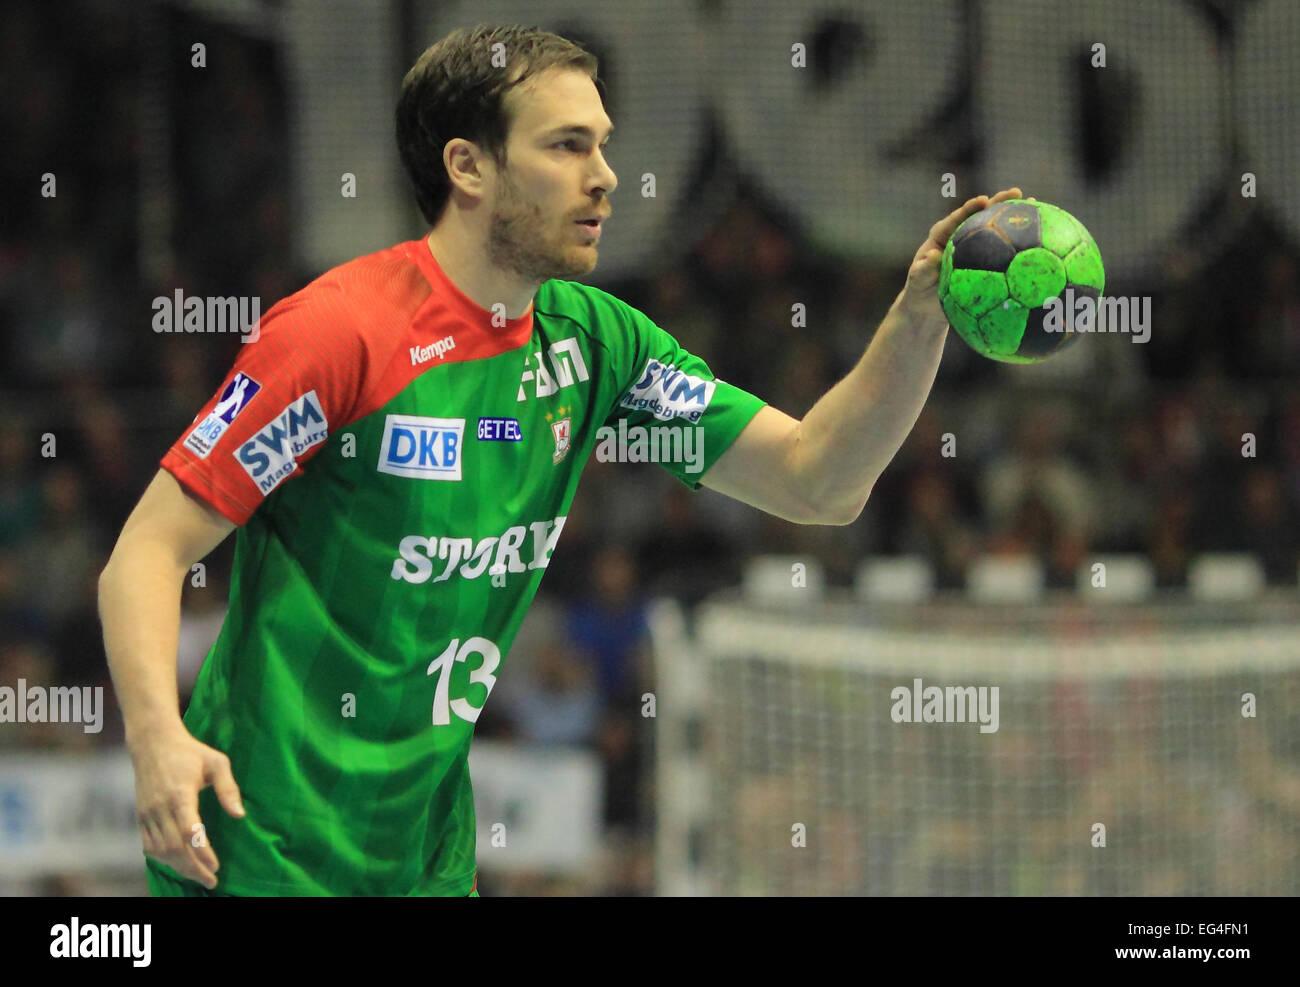 Magdeburg, Germany. 15th Feb, 2015. Magdeburg's Jure Natek in action during the Bundesliga handball match SC - Stock Image